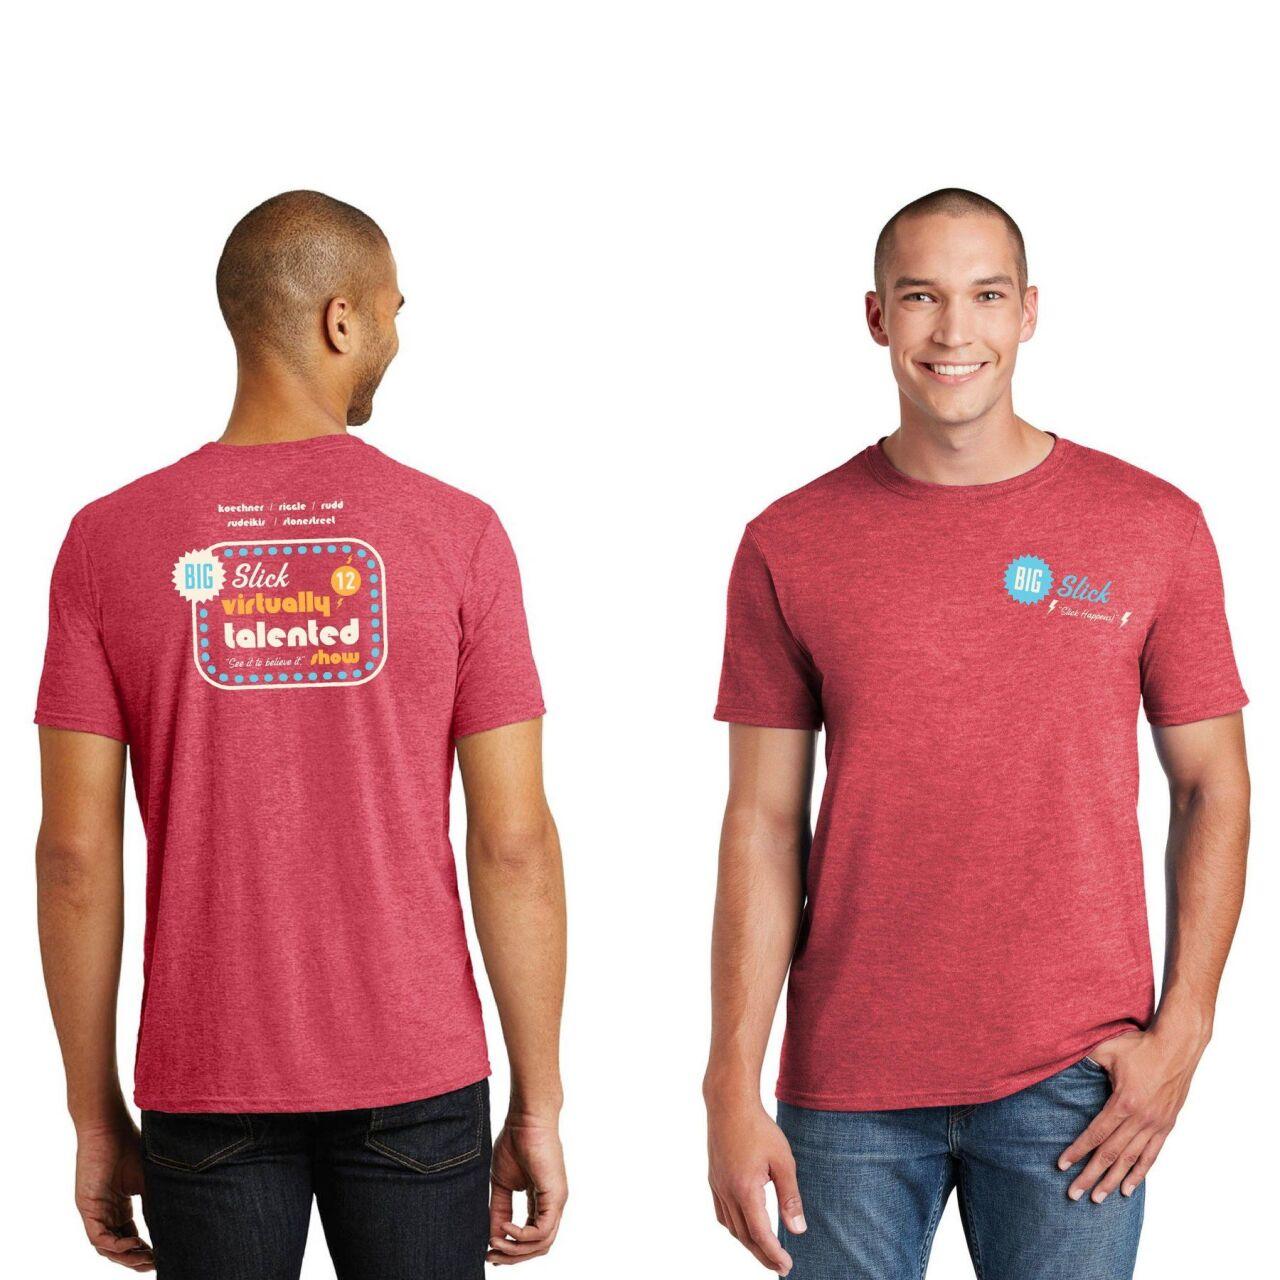 New Big Slick shirt for 2021